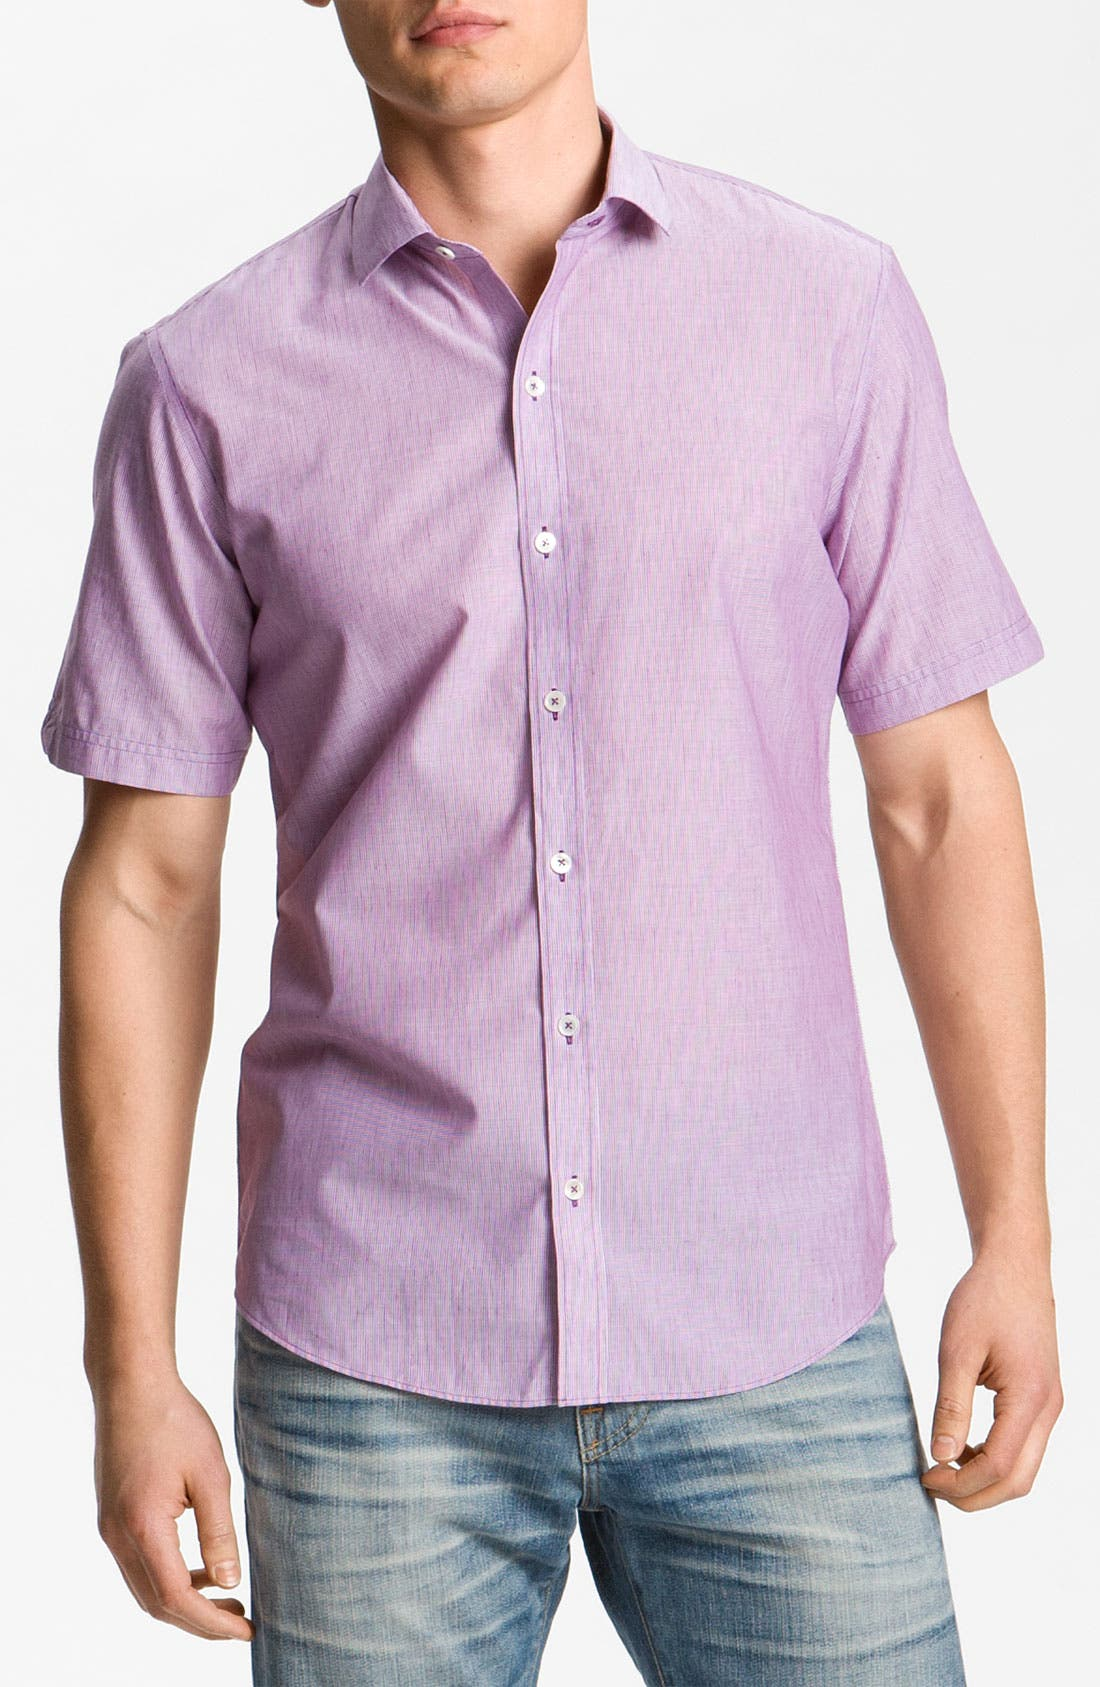 Alternate Image 1 Selected - Zachary Prell 'Jeremy' Sport Shirt